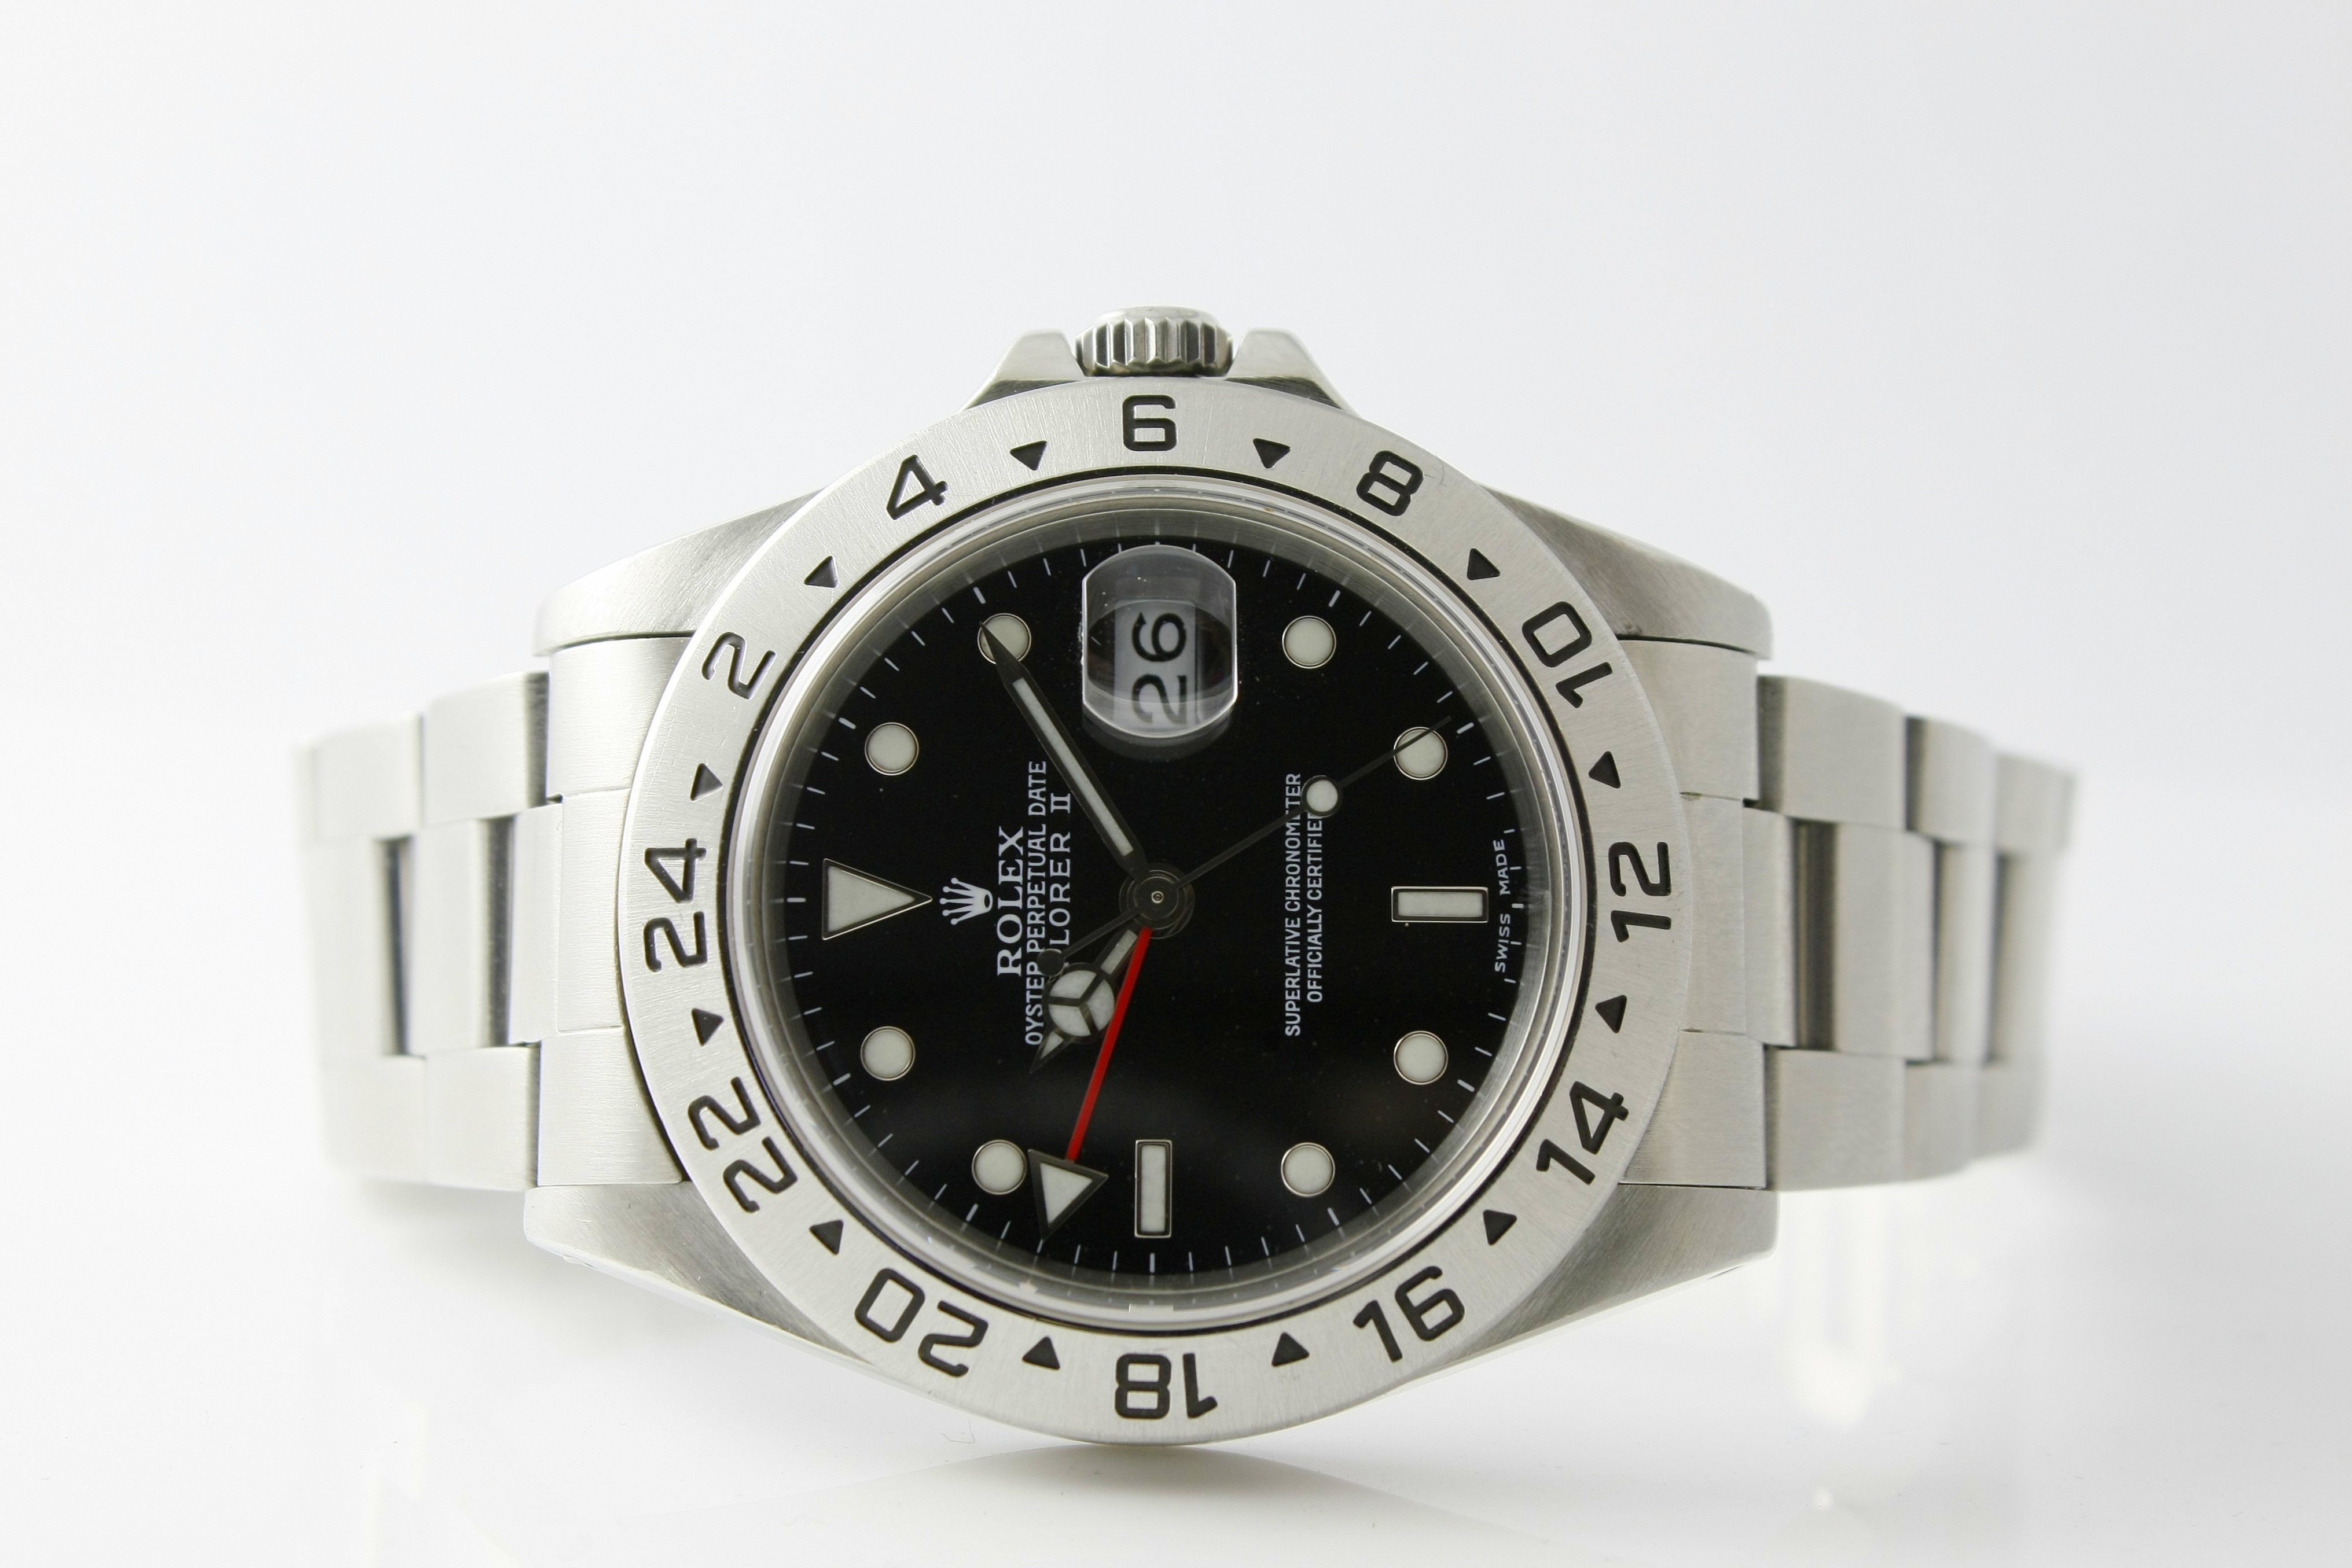 Rolex Explorer - $4,300